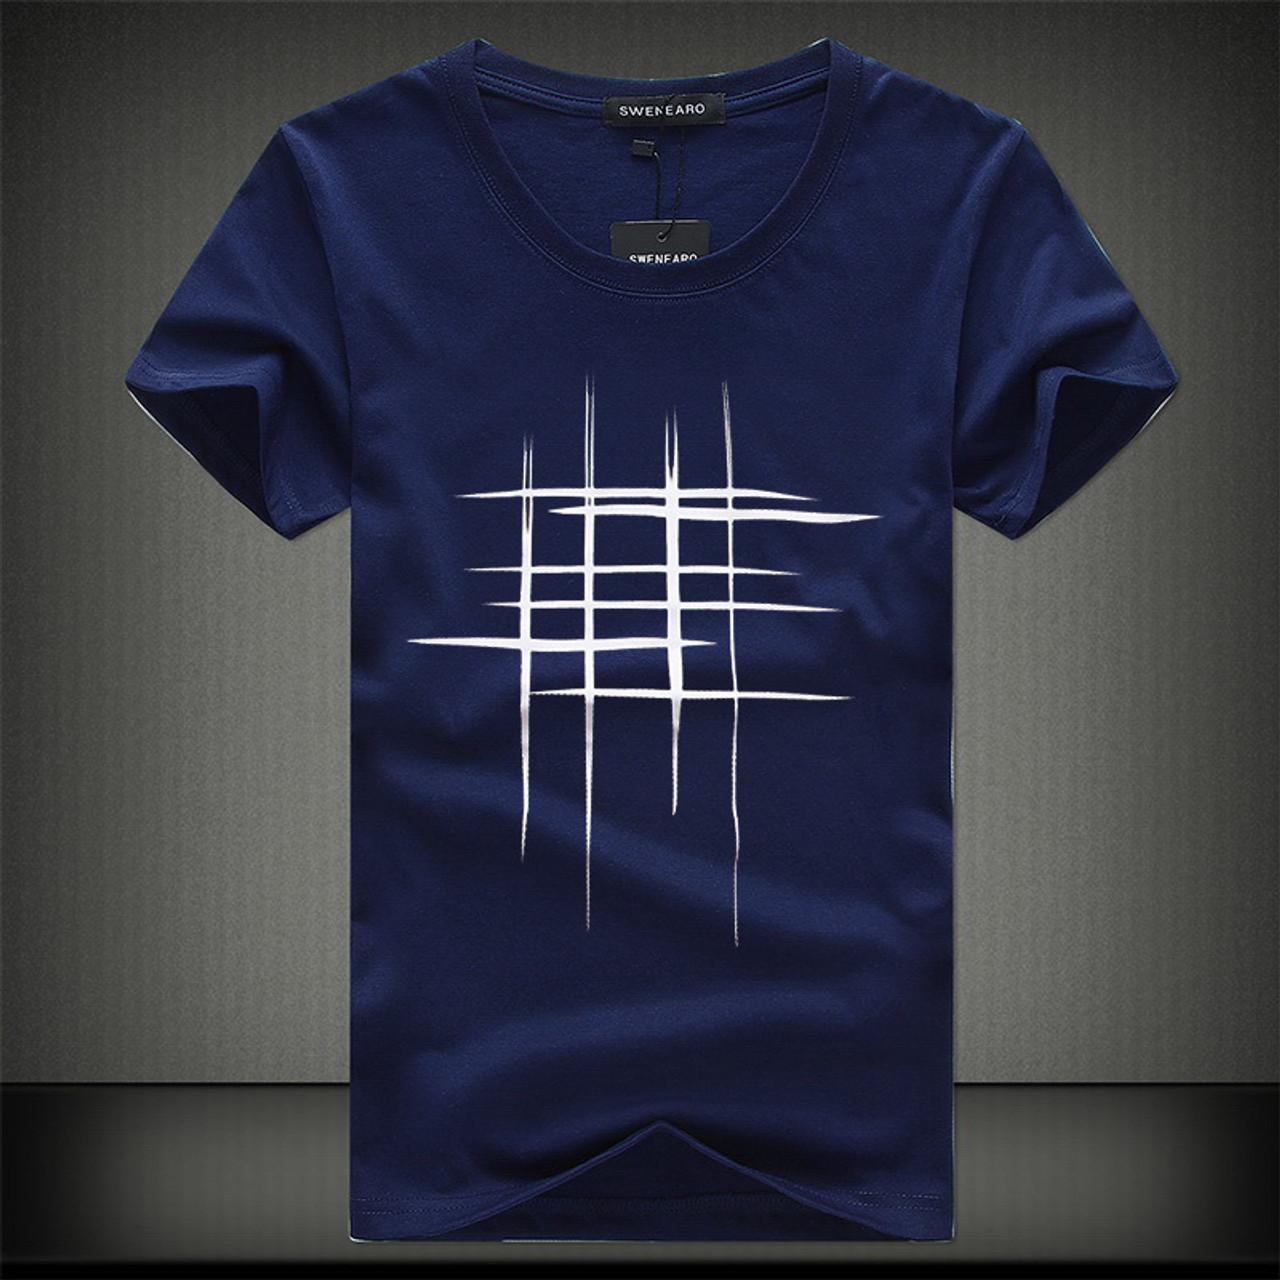 SWENEARO 2018 Simple creative design line cross Print cotton T Shirts Men's  New Arrival Summer Style Short Sleeve Men t-shirt - OnshopDeals.Com